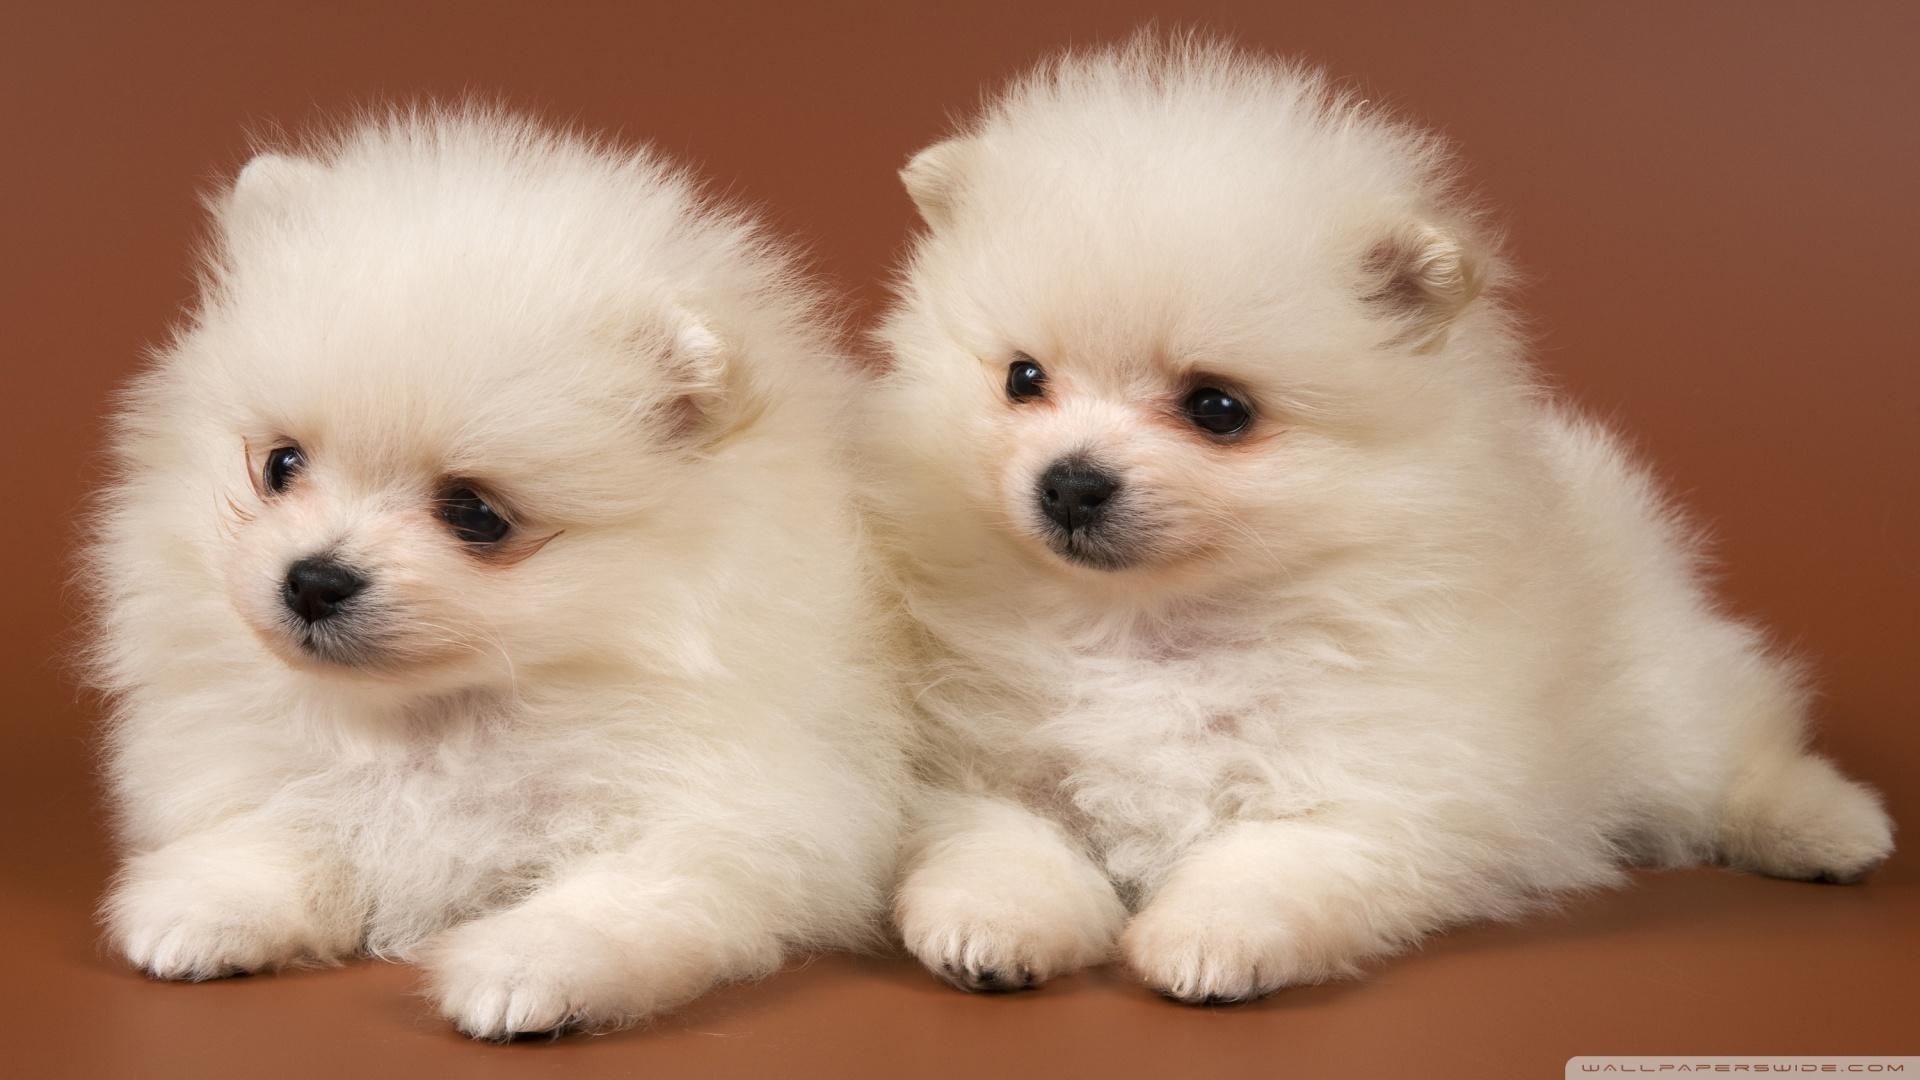 Pomeranian Puppies HD desktop wallpaper : High Definition : Mobile